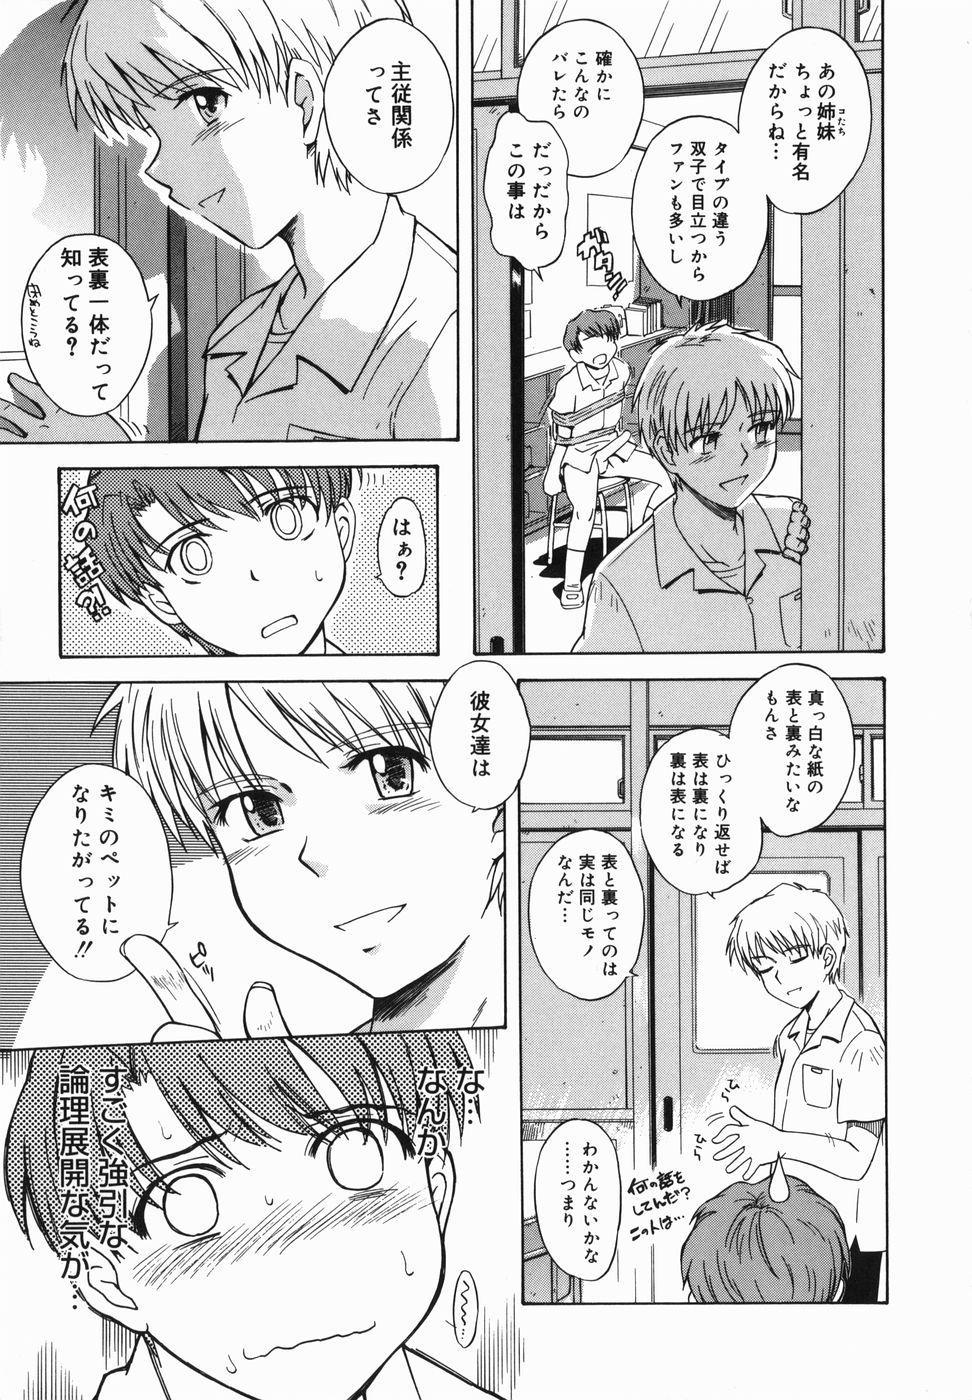 ♭38℃ Loveberry Twins 16